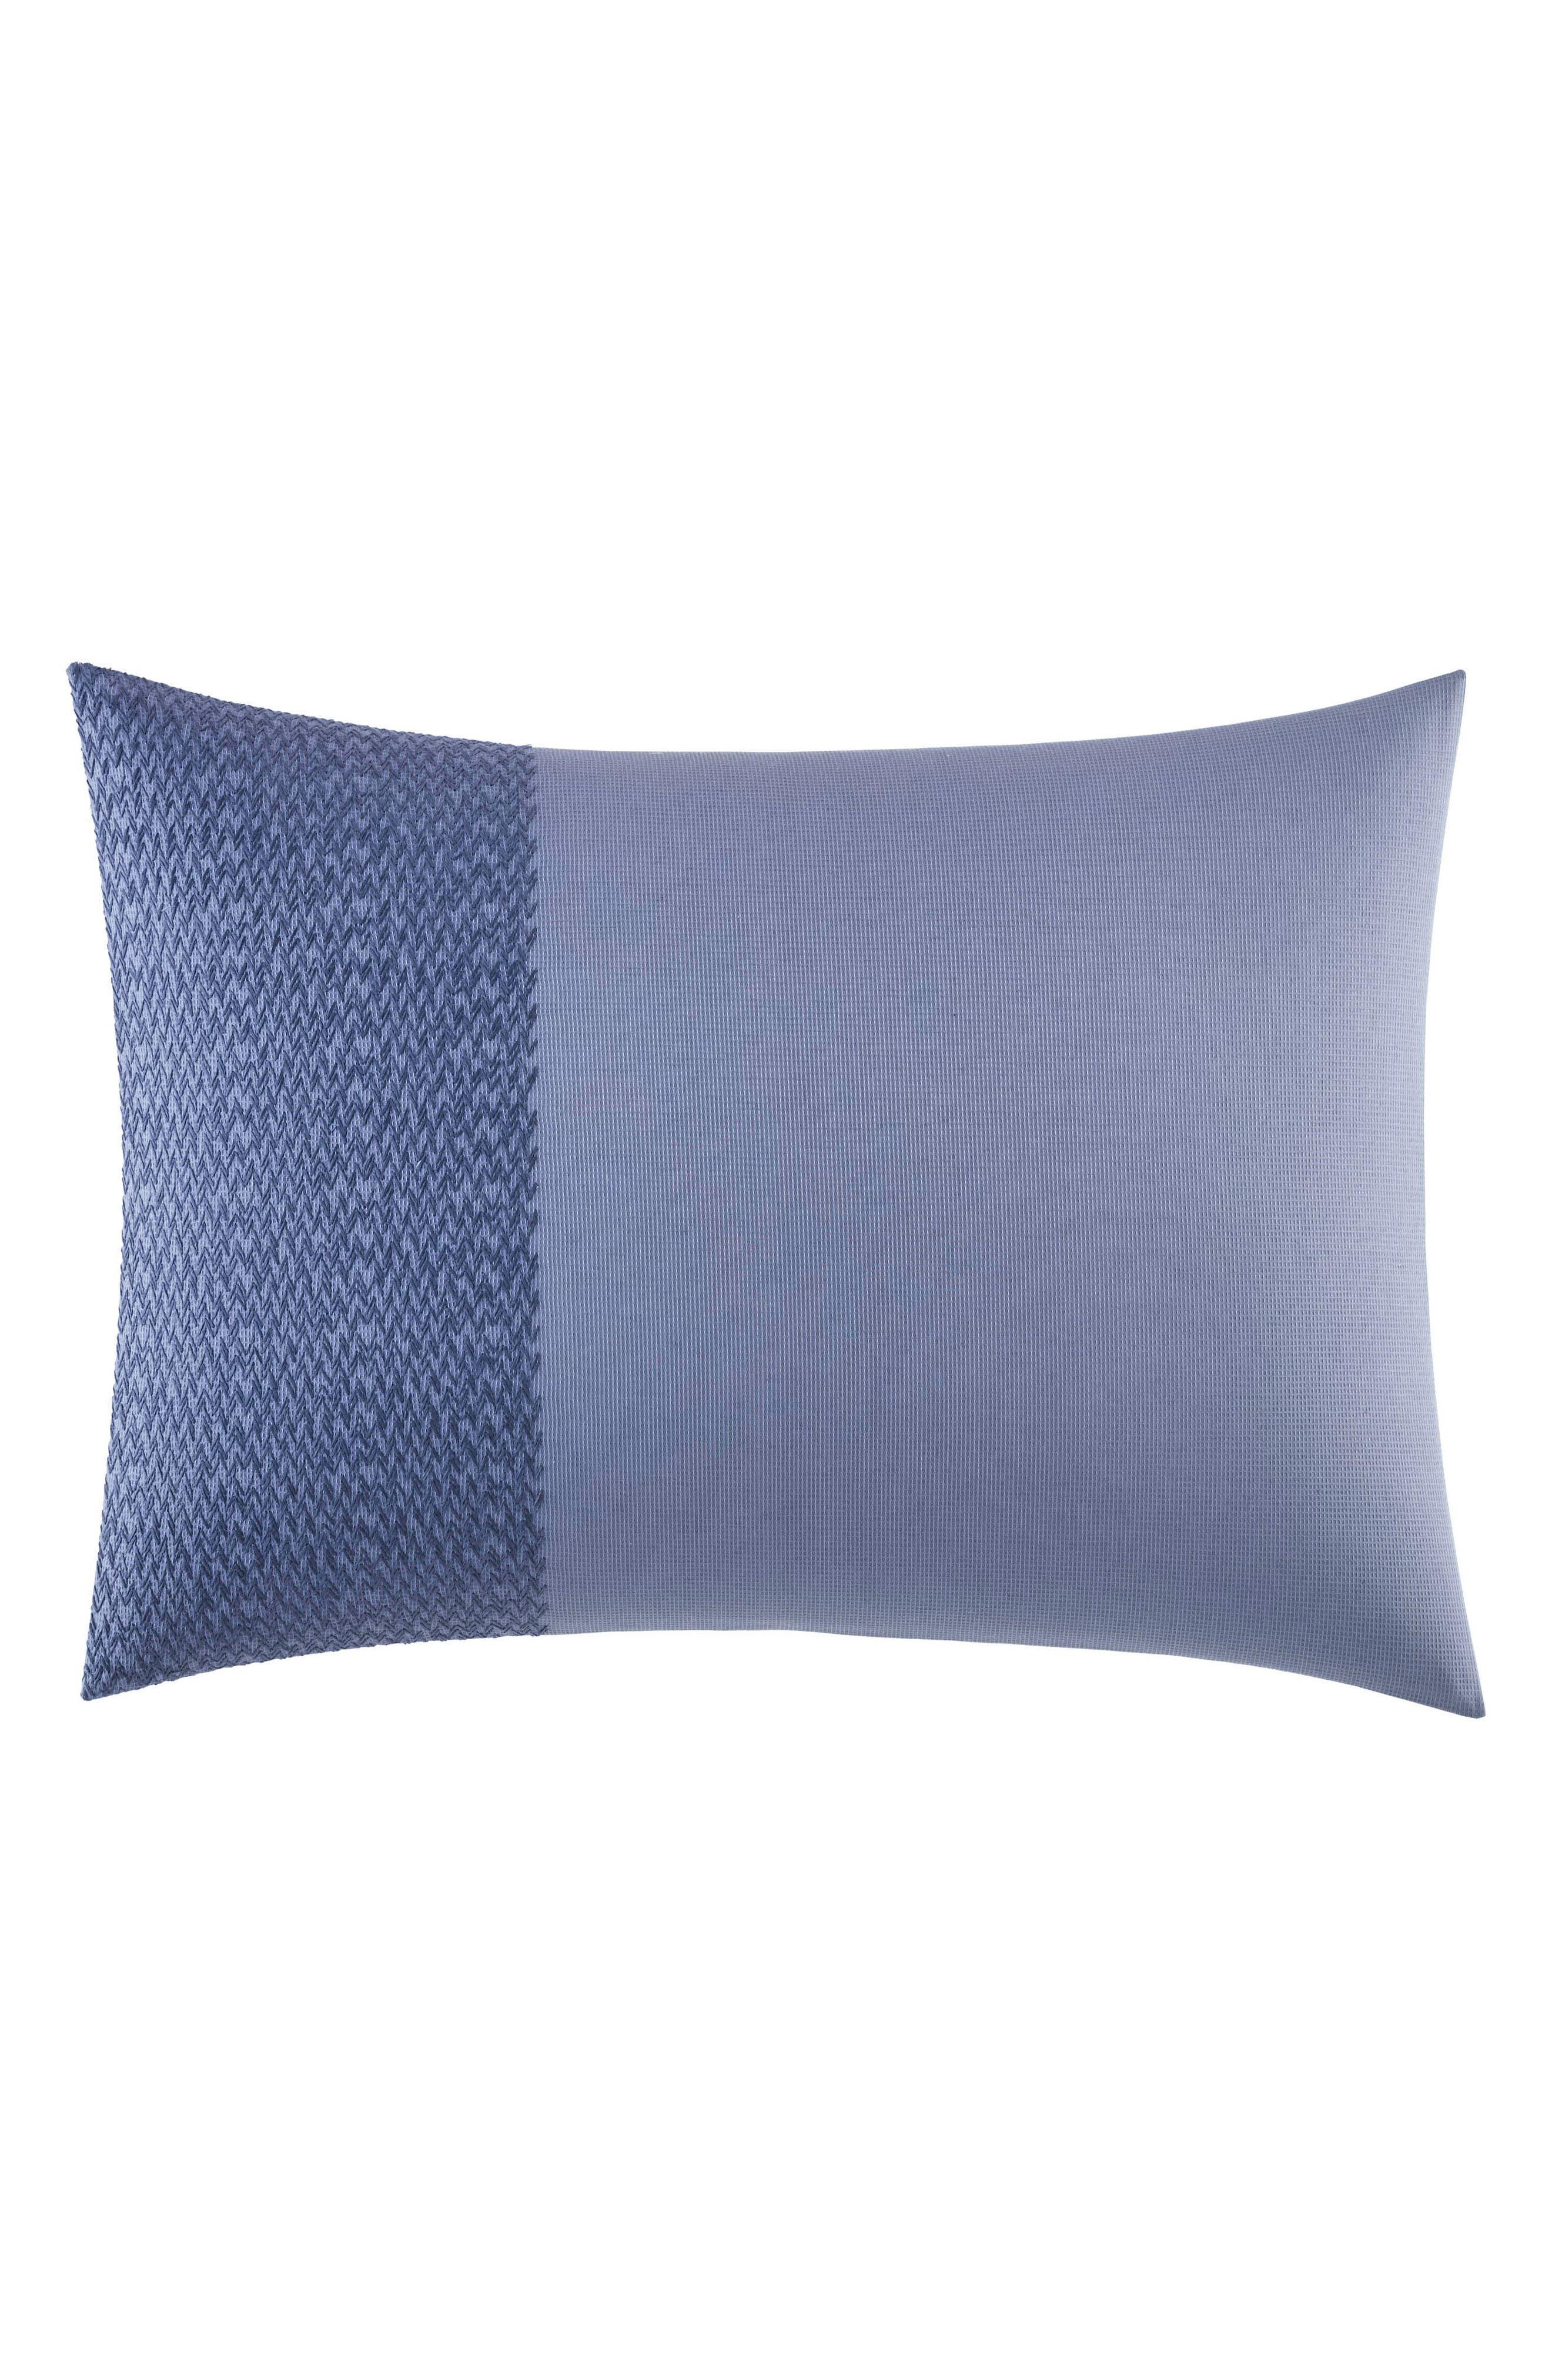 Vera Wang Chevron Breakfast Pillow